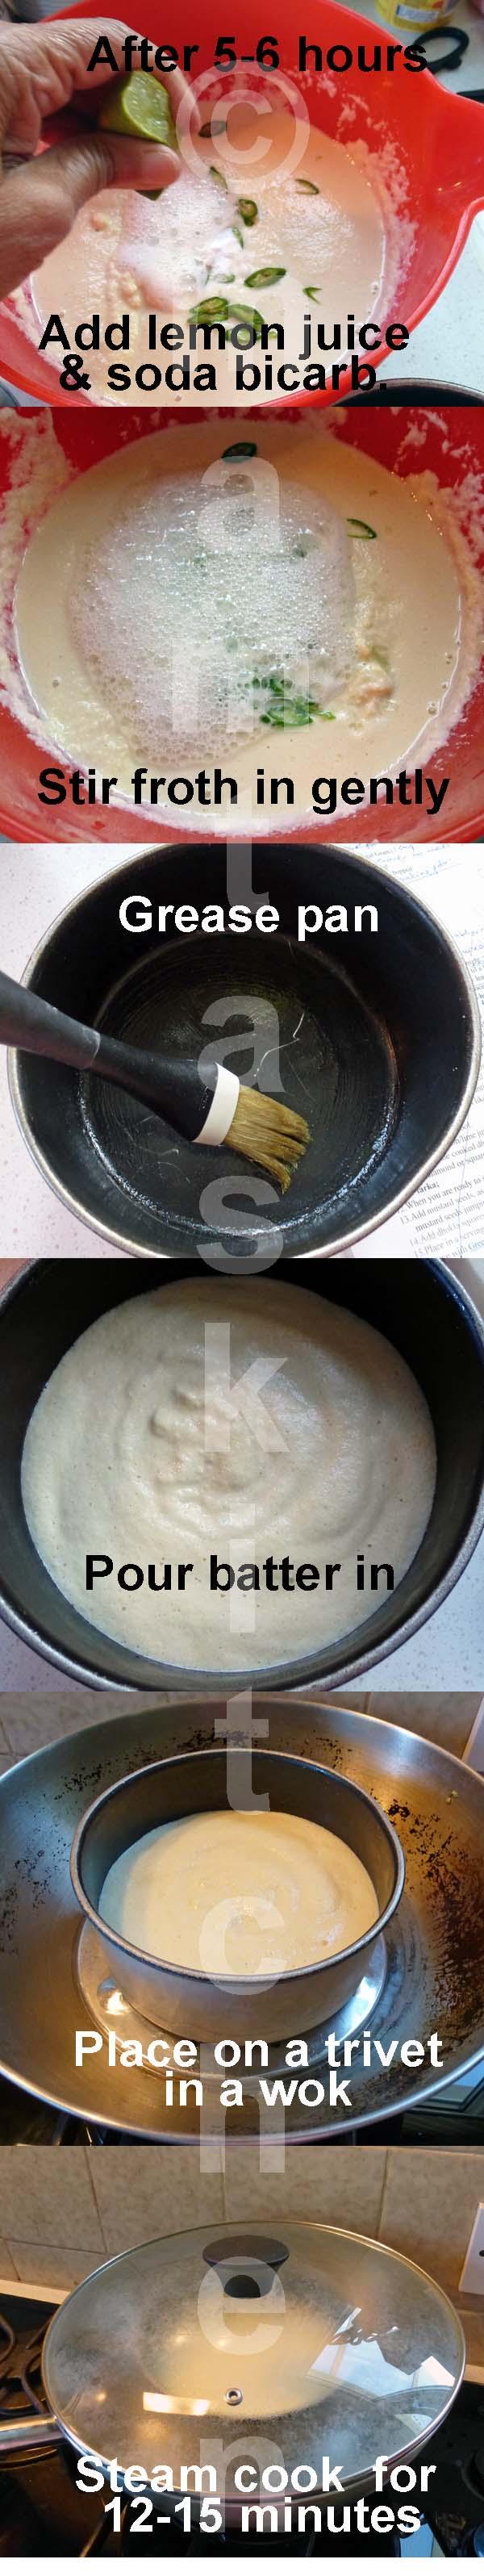 Dhokla - 1, Chana Dal & Rice Savoury Steamed Cakes, Abha's